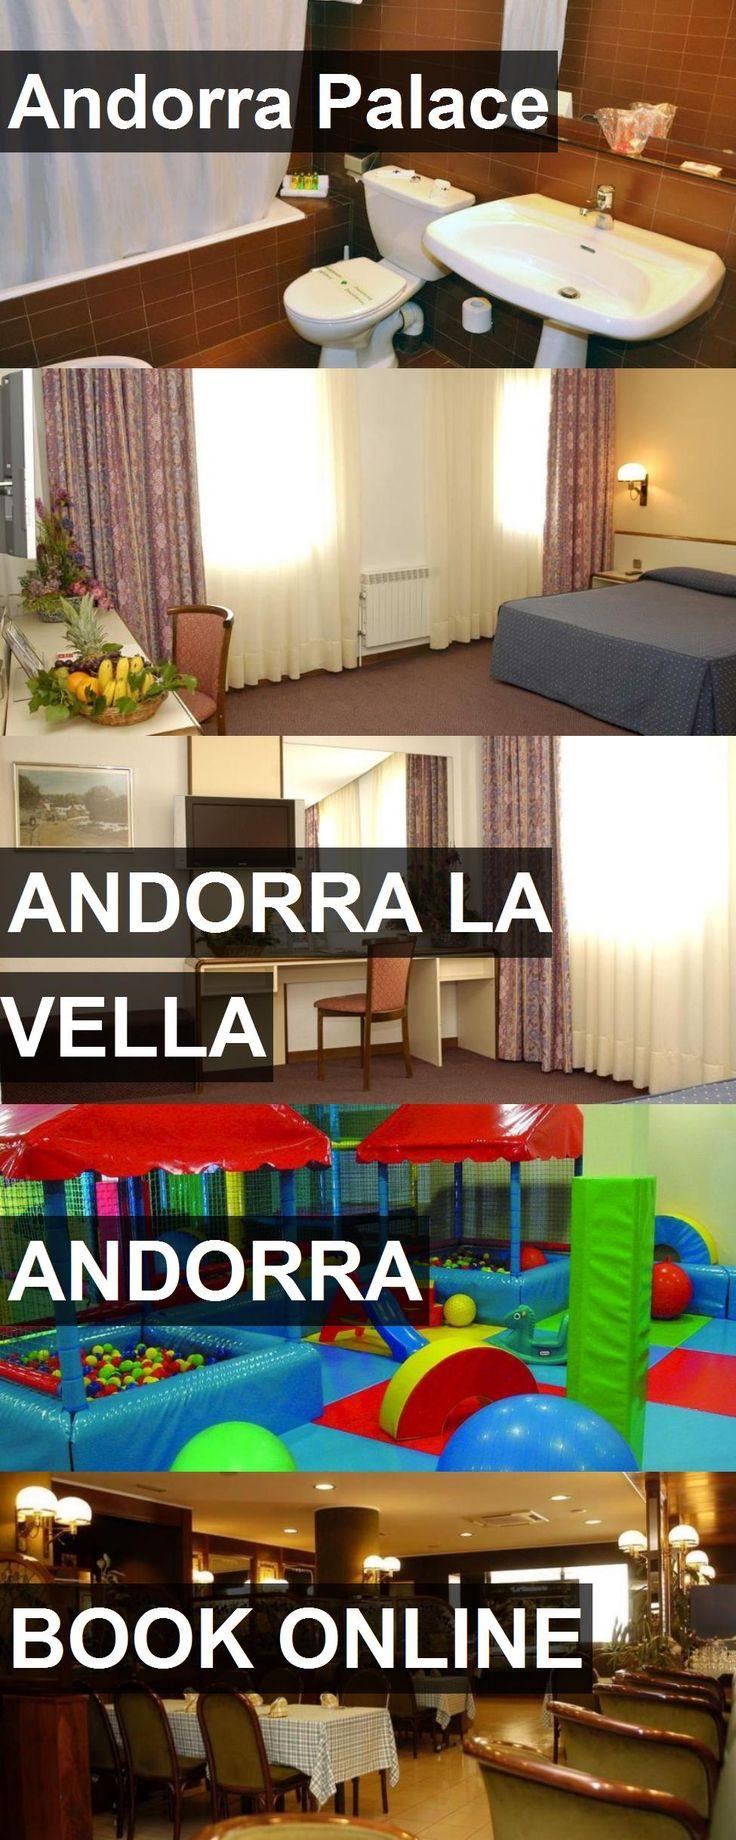 Hotel Andorra Palace in Andorra La Vella, Andorra. For more information, photos, reviews and best prices please follow the link. #Andorra #AndorraLaVella #hotel #travel #vacation